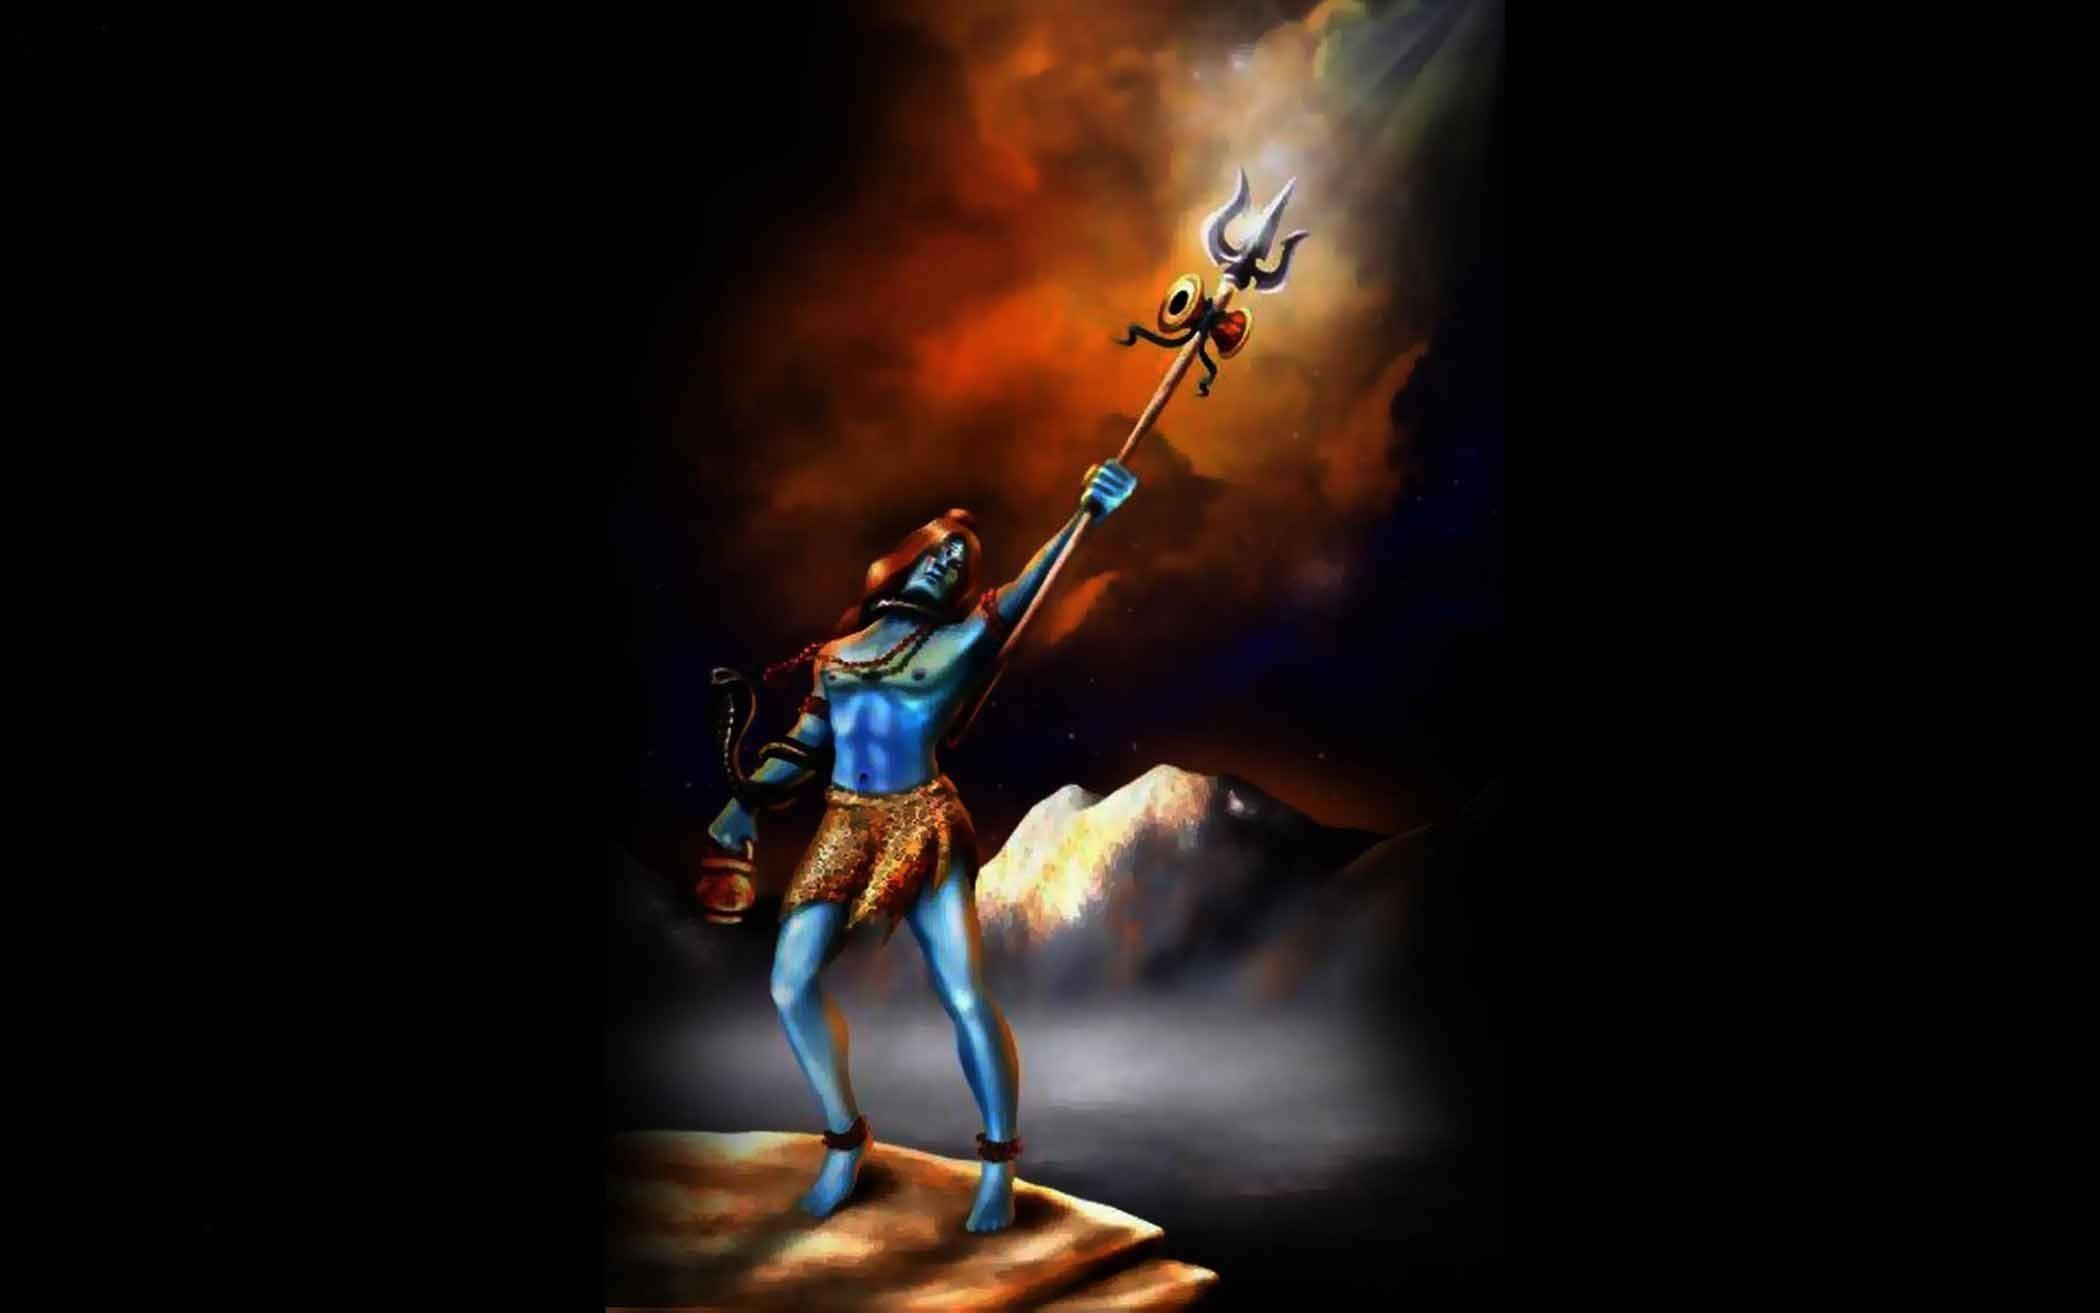 Bhakt Mahakal Ka Dialogue Mahadev Ringtone In 2021 Lord Shiva Hd Wallpaper 4k Wallpaper For Mobile Hd Wallpapers For Mobile